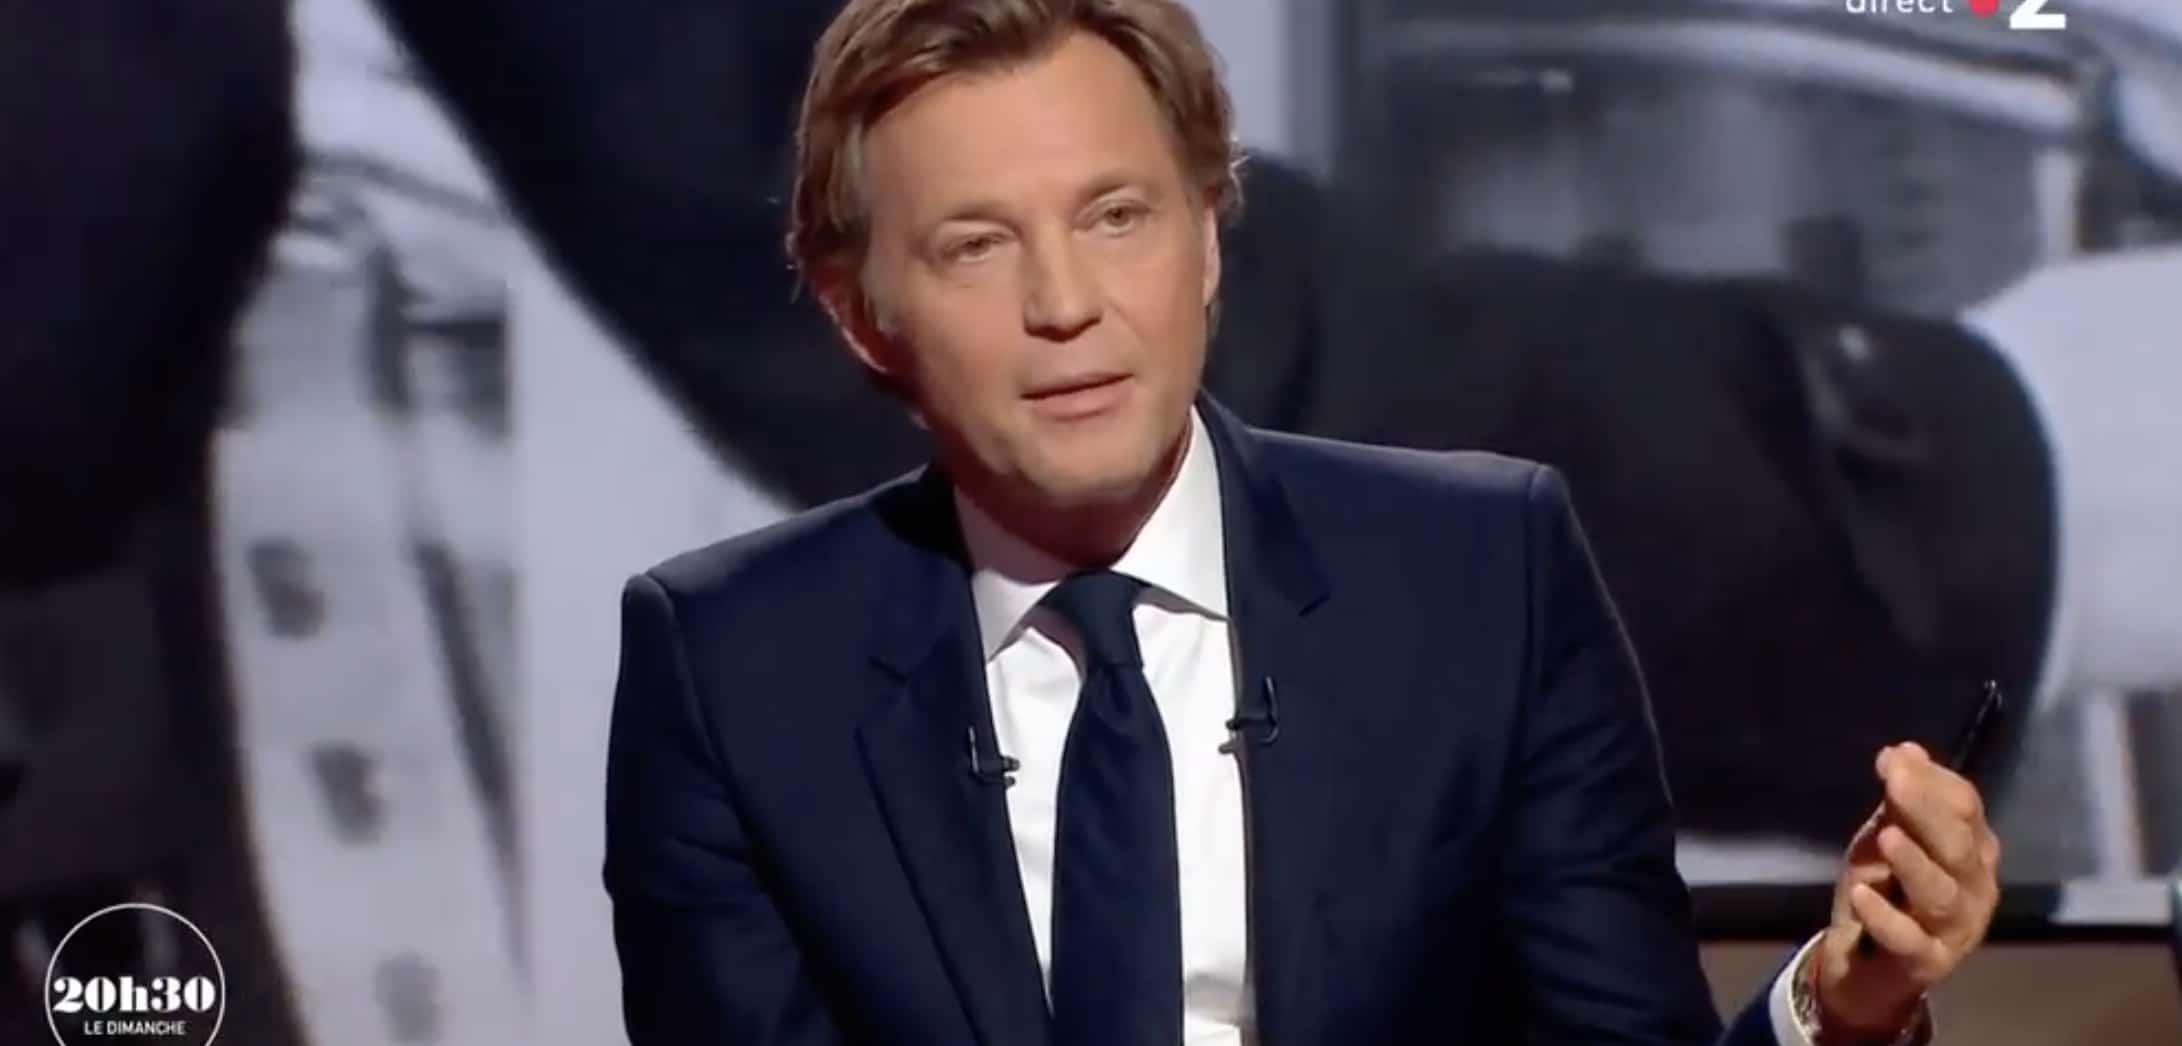 Laurent